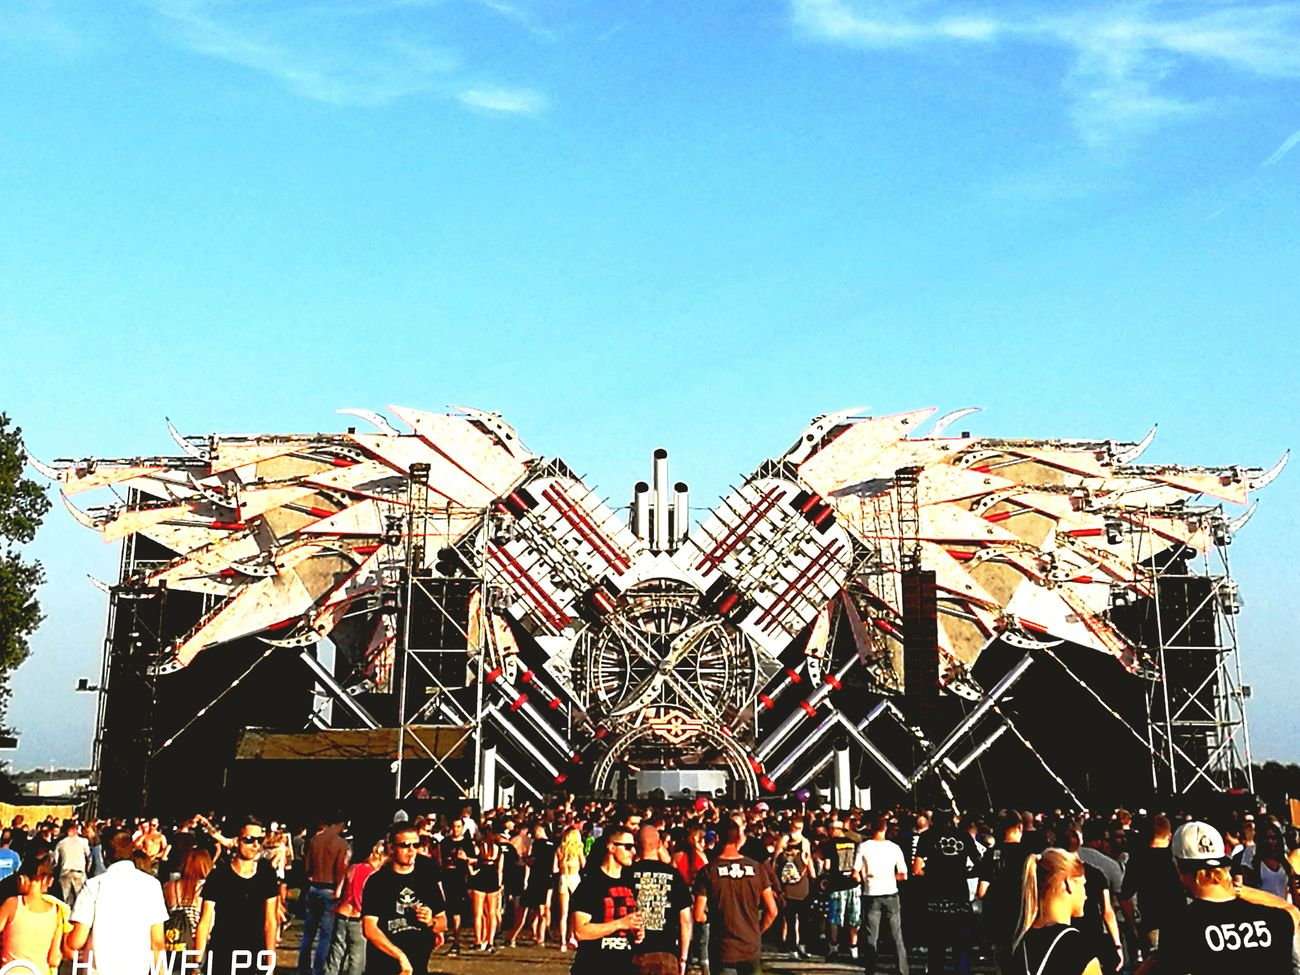 Q-Base Mainstage Lifestyles Clear Sky Famous Place Feiern Electric Light Floor Outdoors Festivaltime GoHardThenGoHome